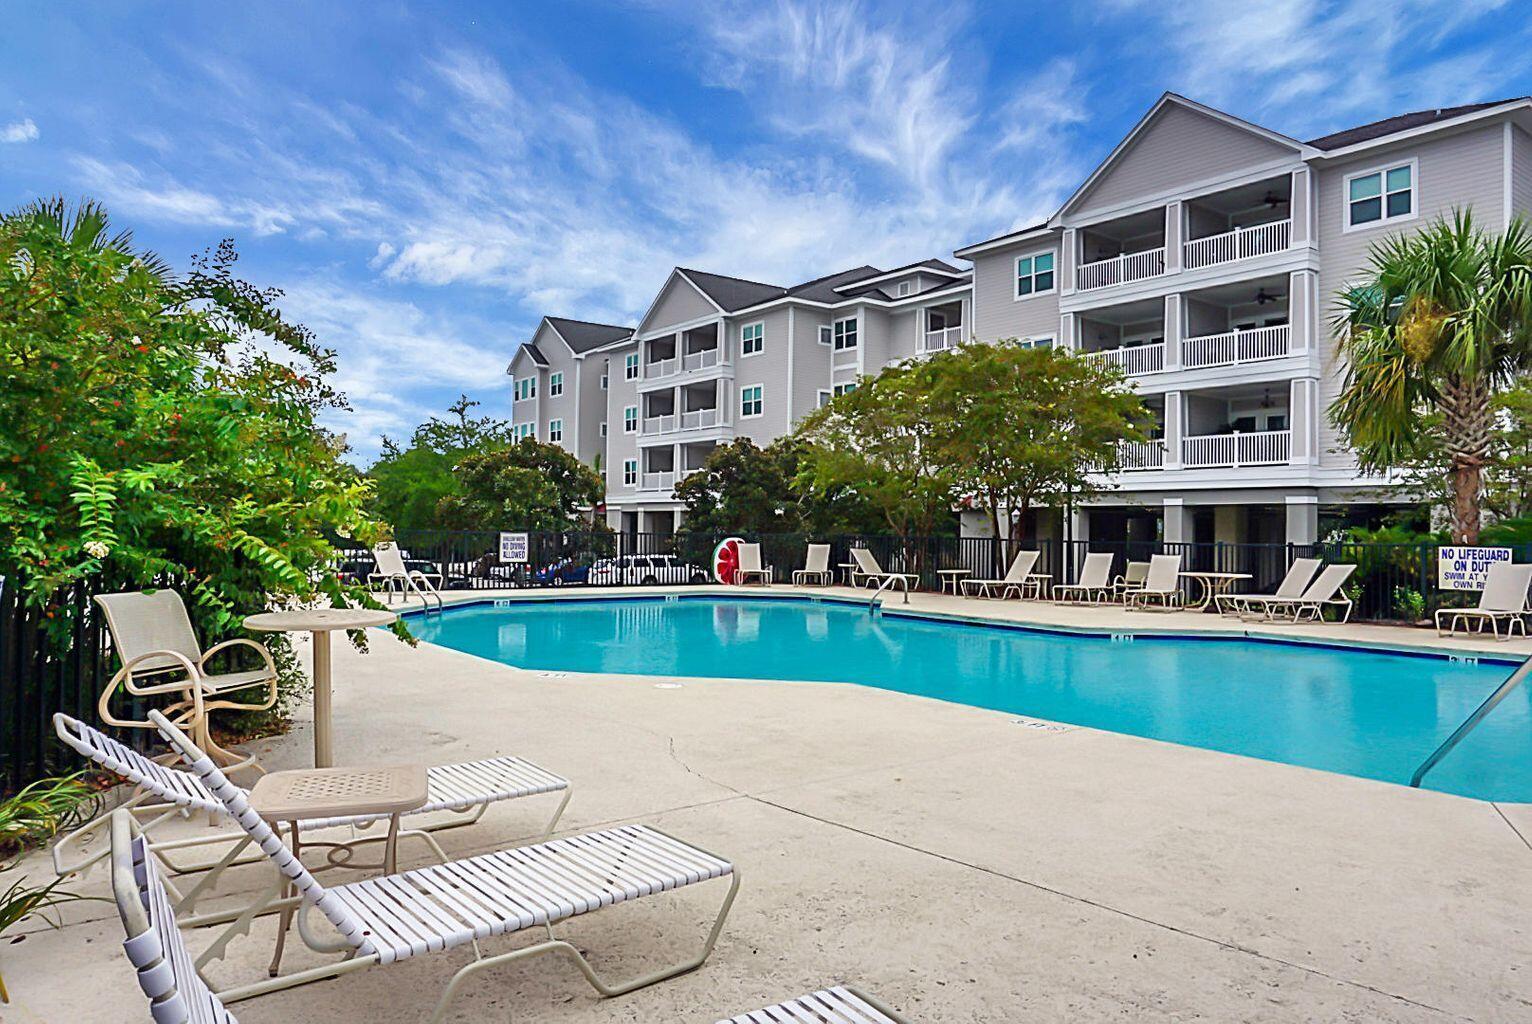 Pelican Pointe Villas Homes For Sale - 1984 Folly, Charleston, SC - 8